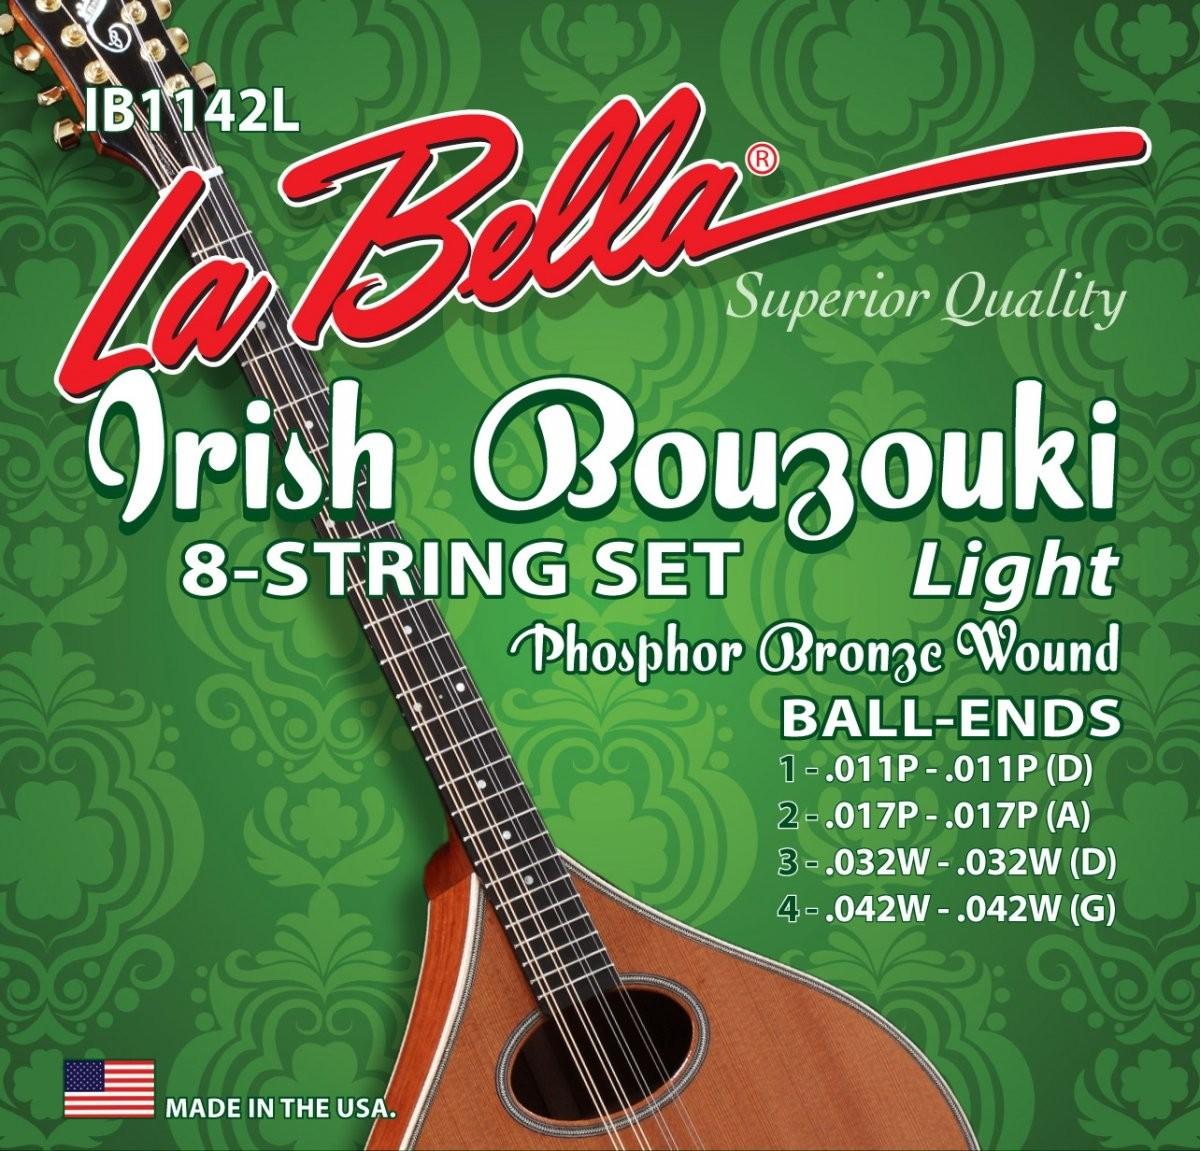 LaBella IB1142L struny buzuki irlandzkie 11-42 phosphor